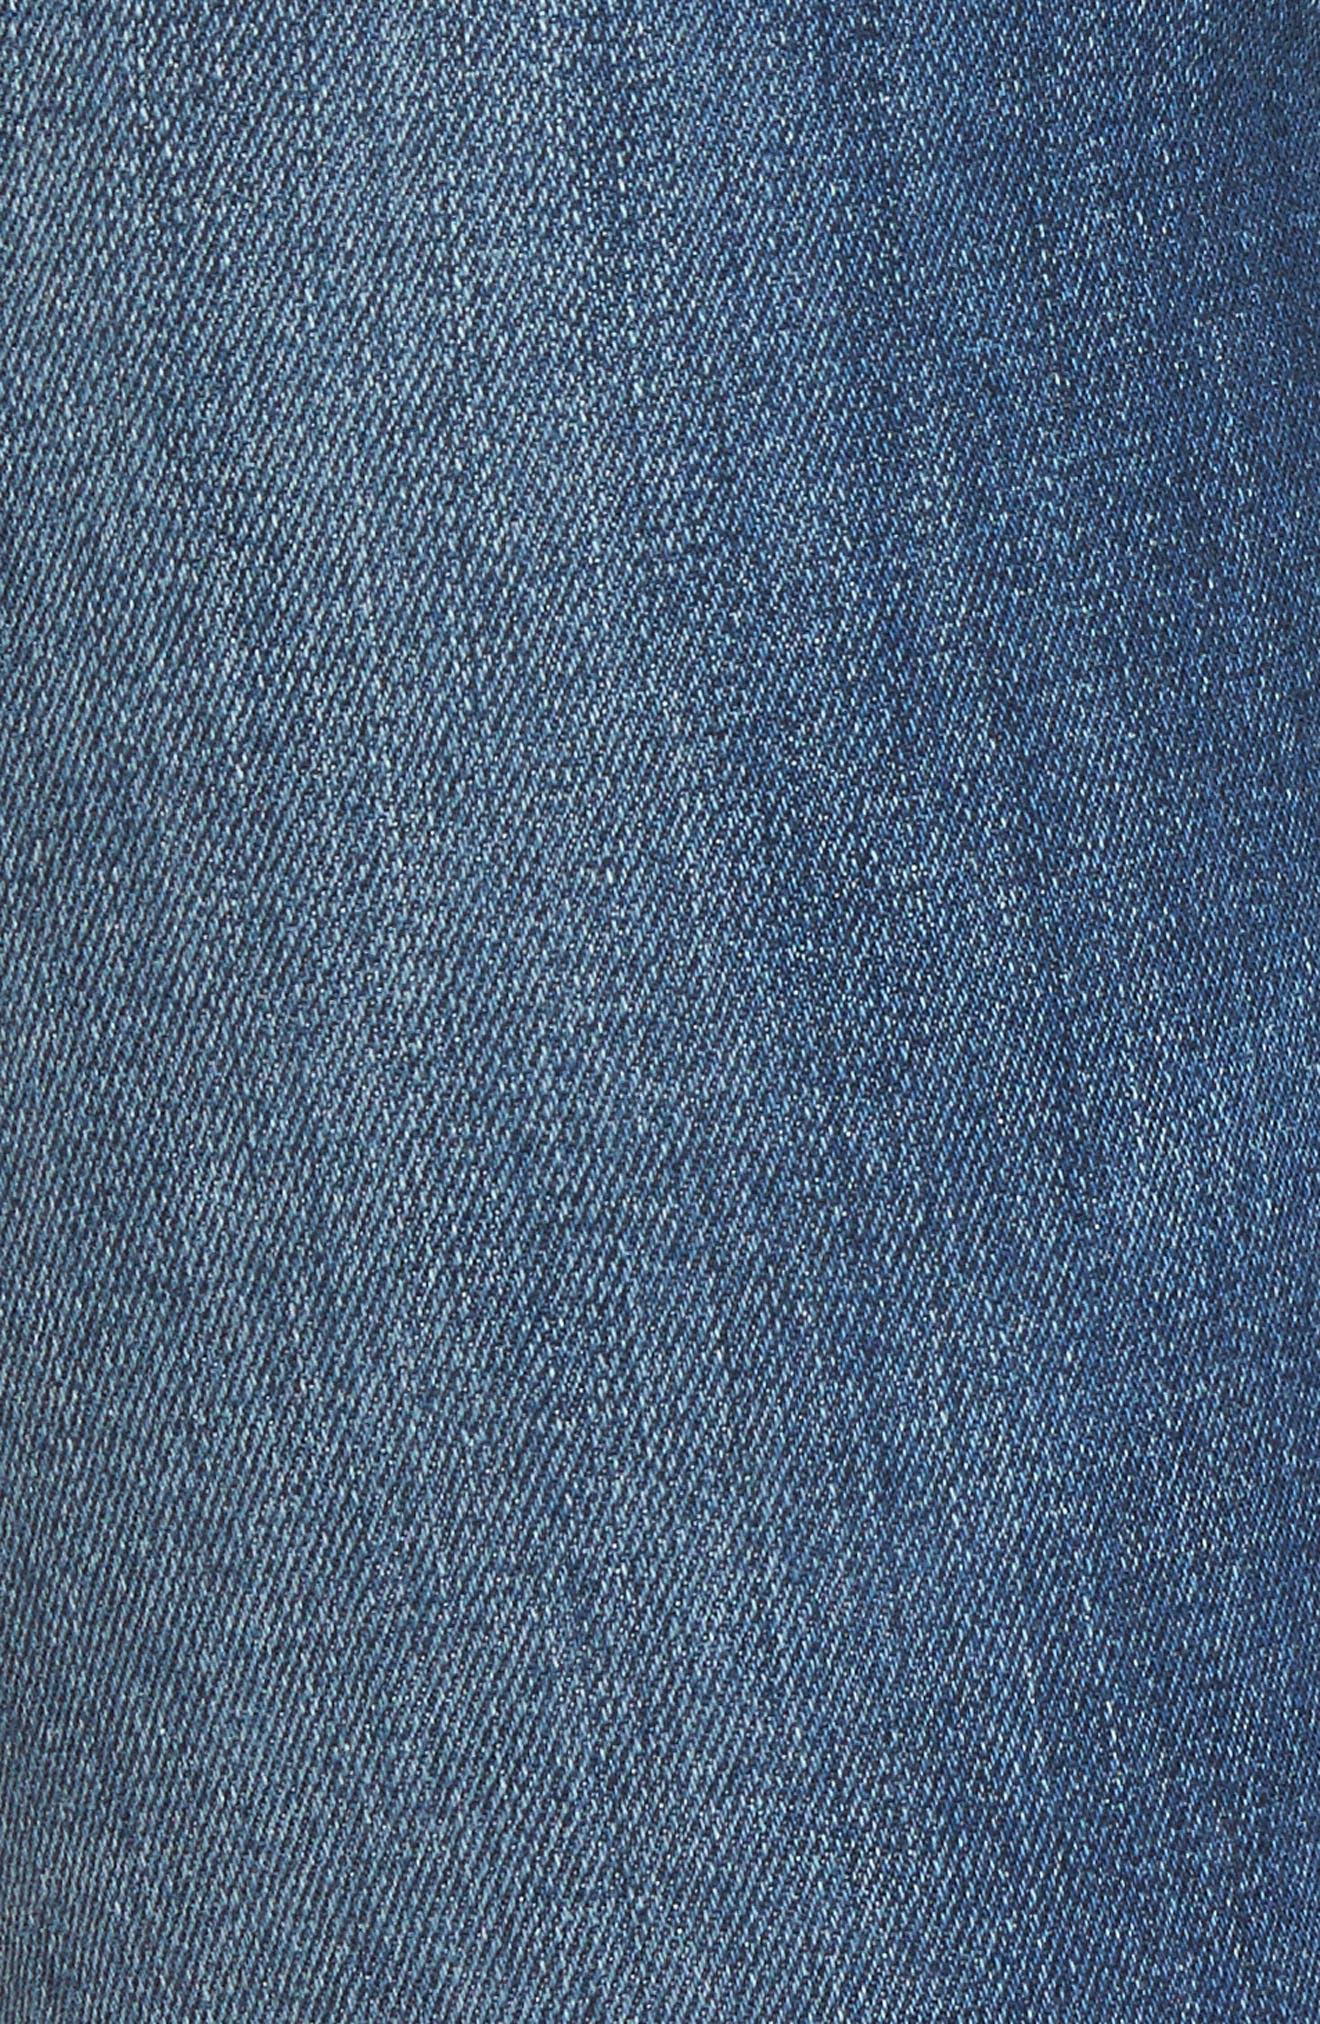 Icon Ankle Skinny Jeans,                             Alternate thumbnail 6, color,                             FERRA